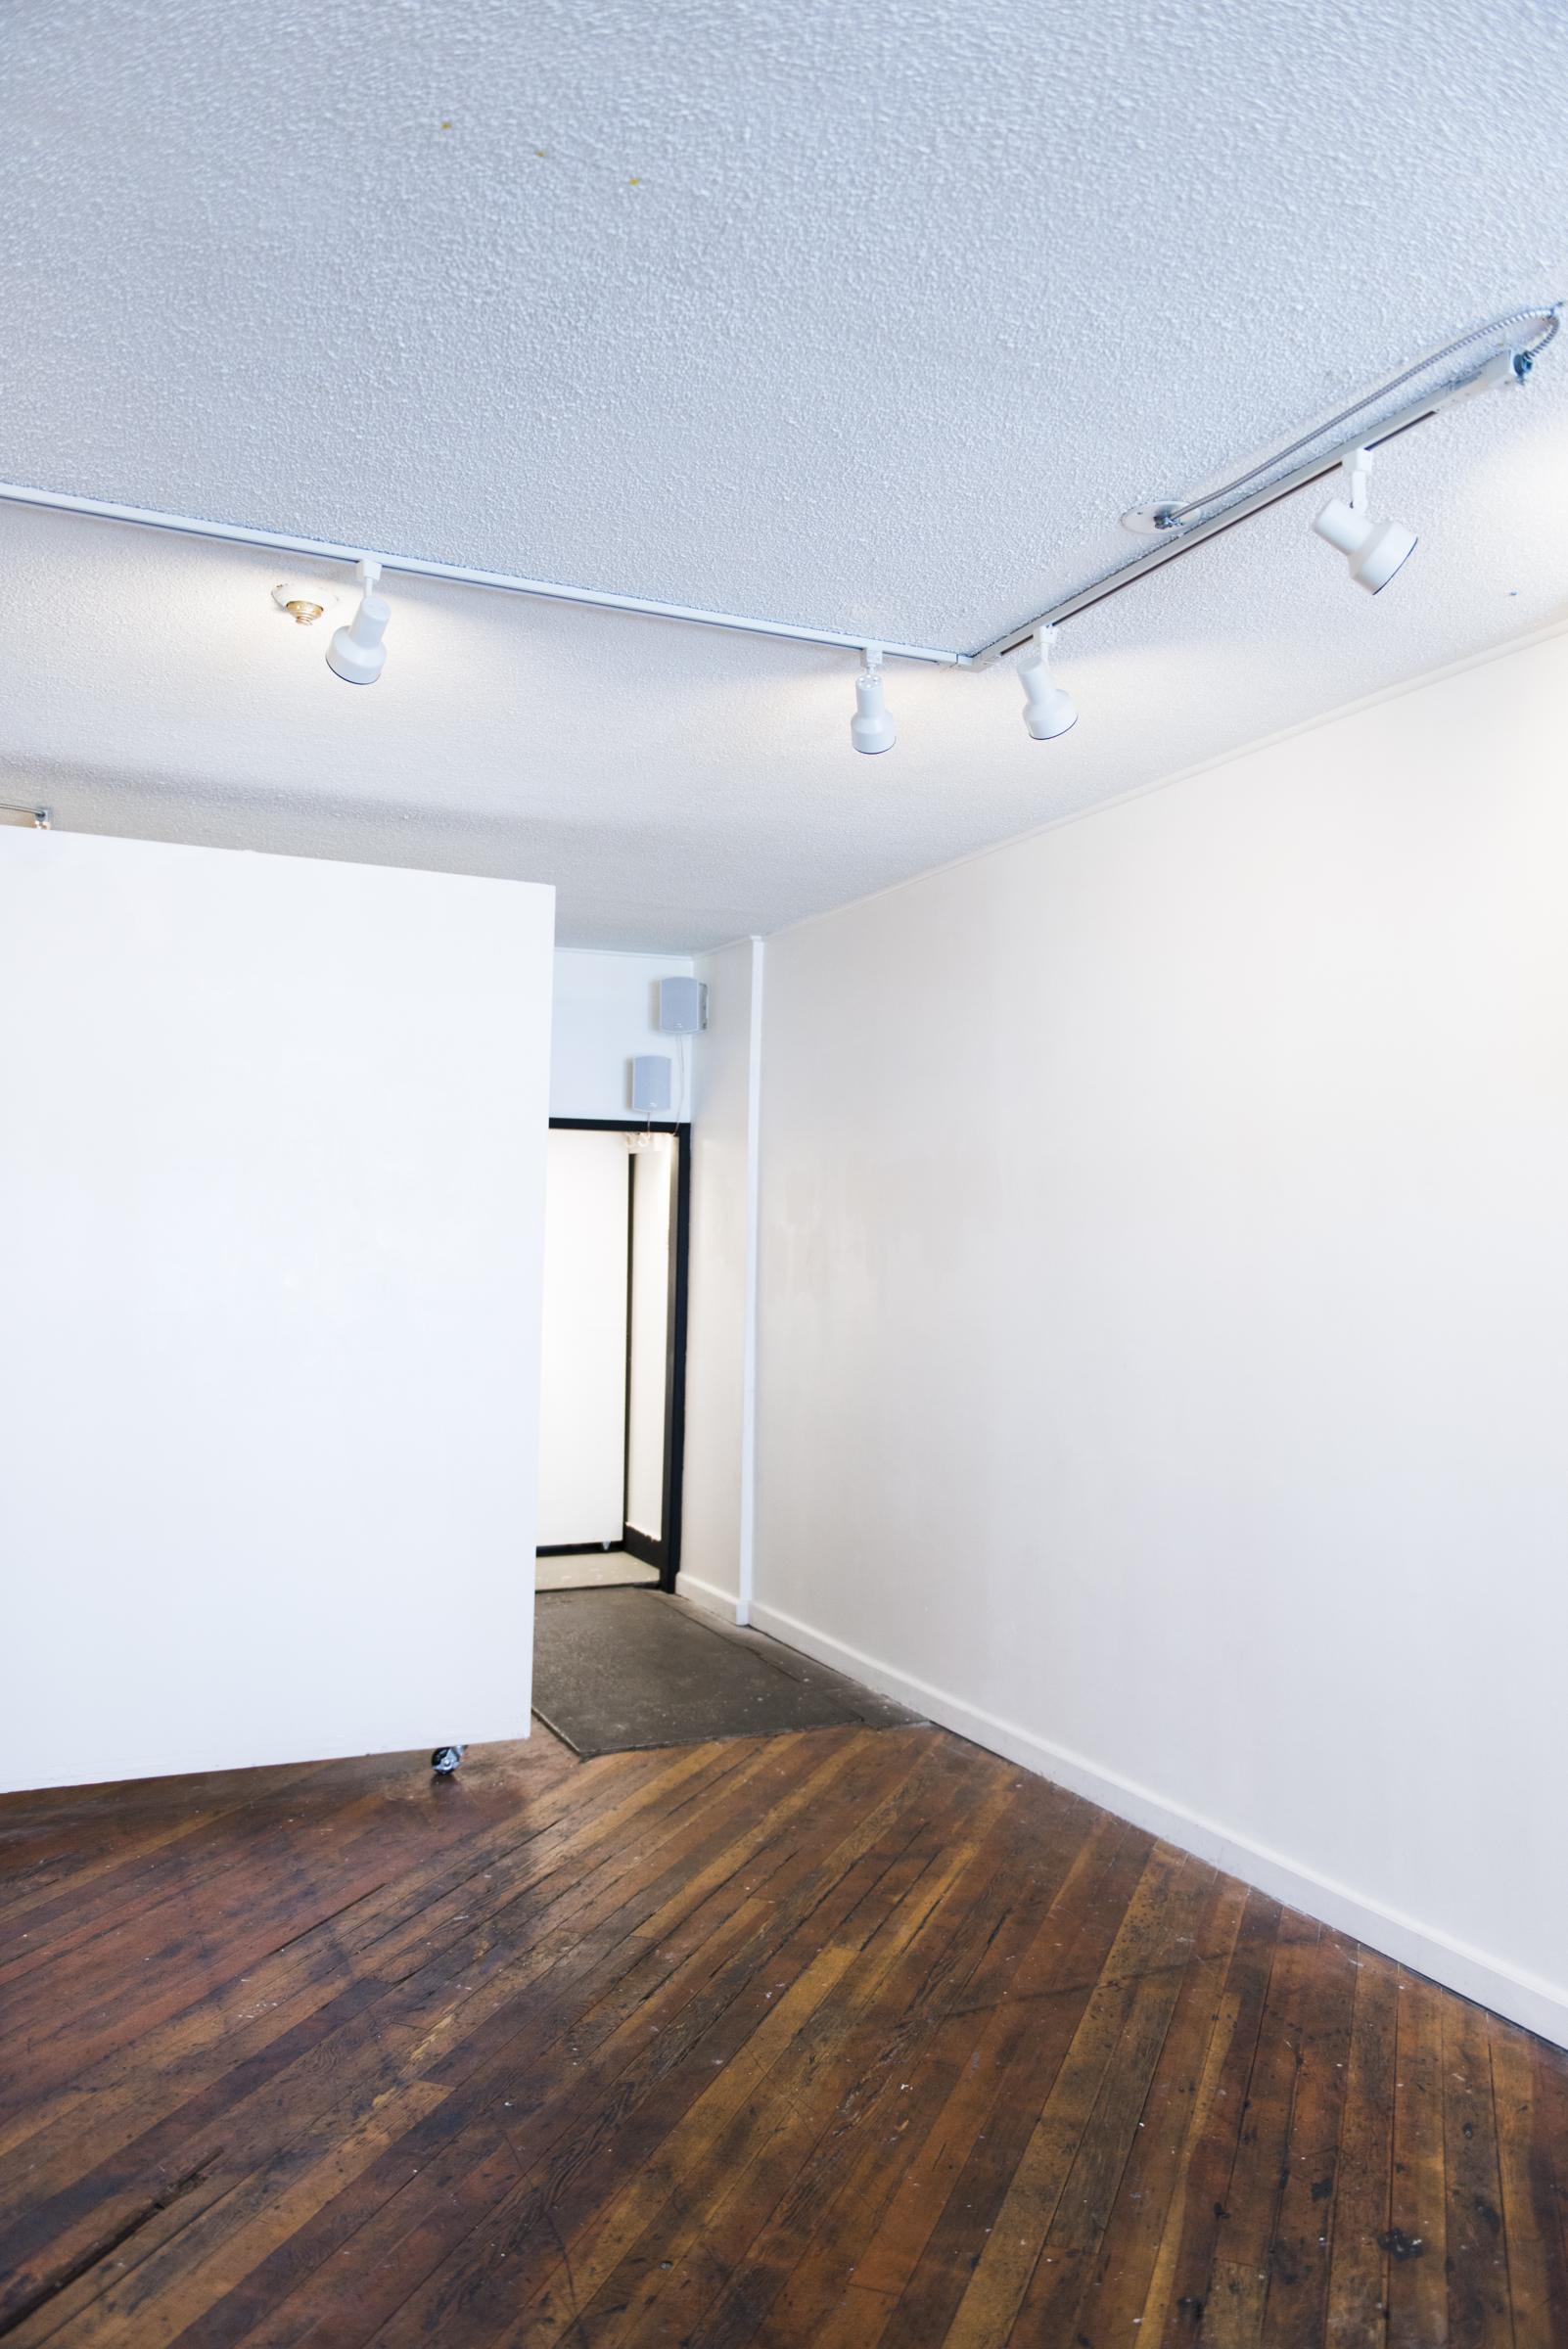 Untitled interior 6588